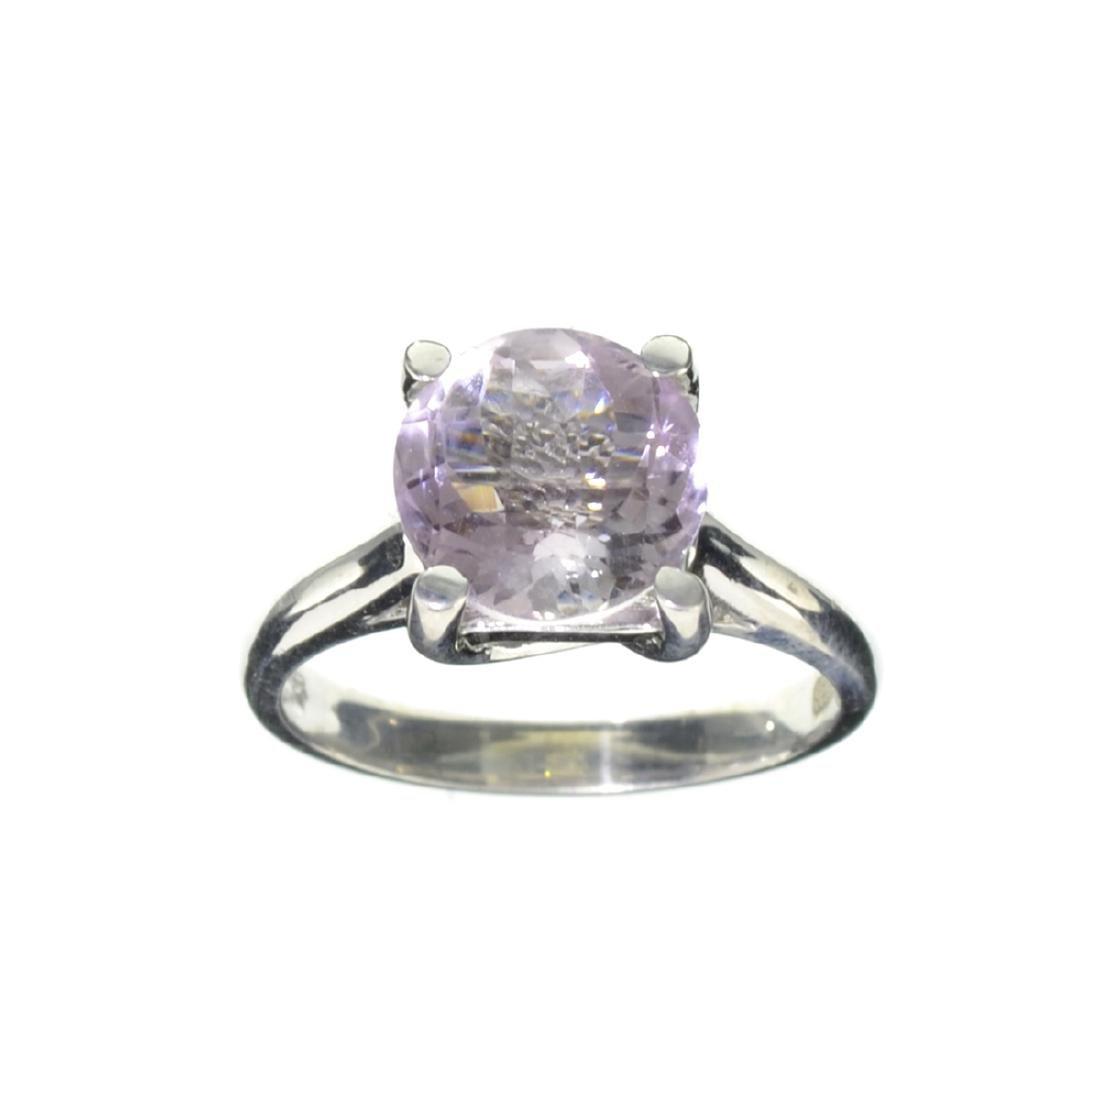 APP: 0.5k Fine Jewelry Designer Sebastian, 2.75CT Round